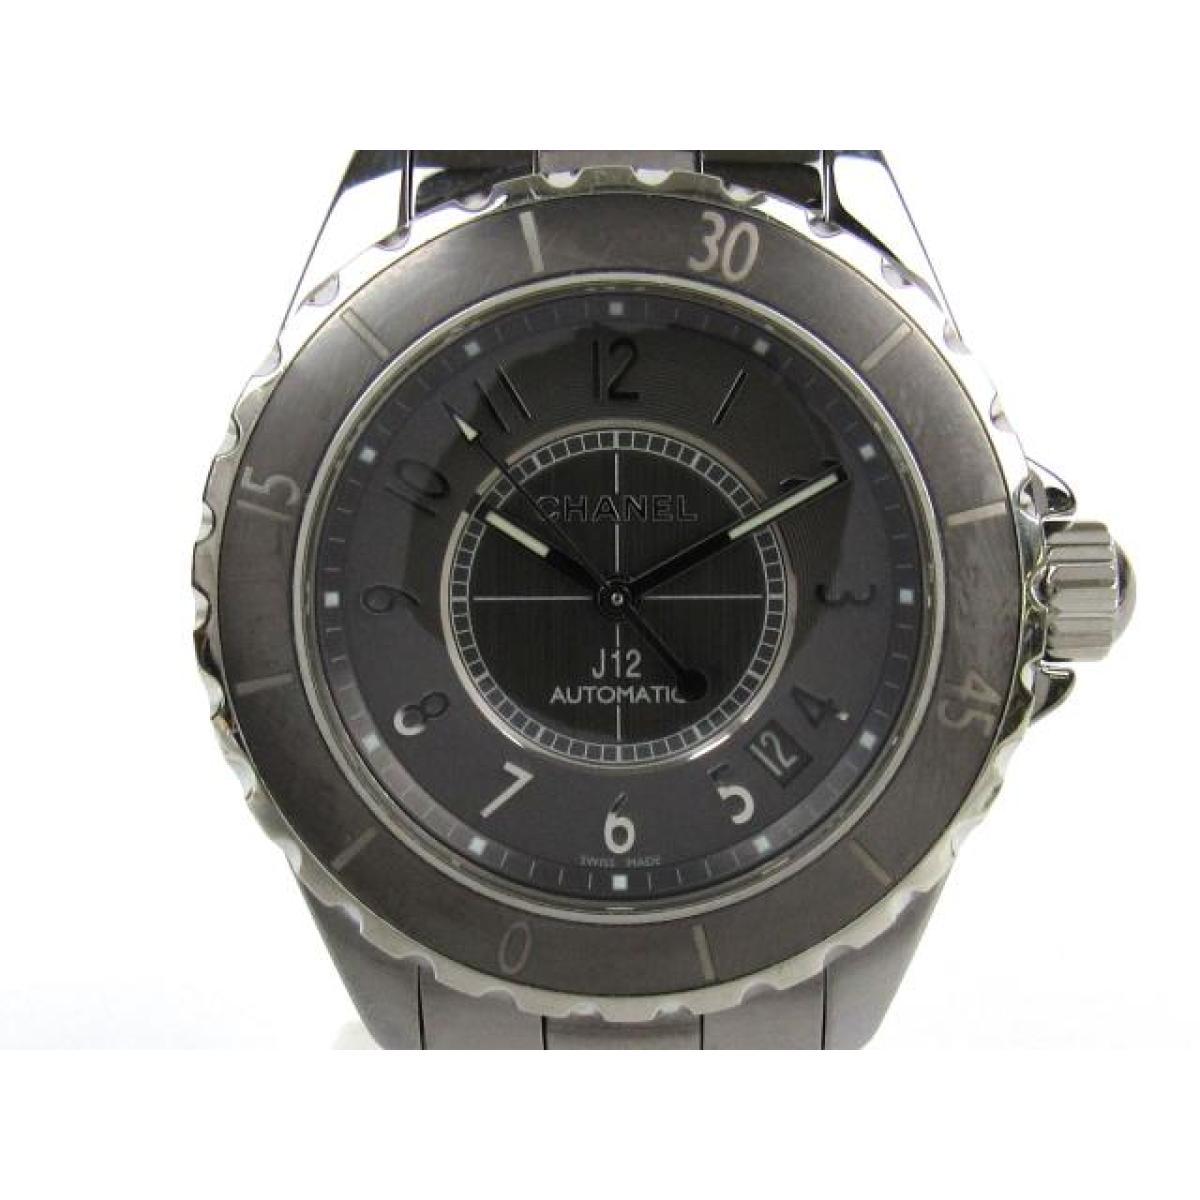 the latest a07a8 7f8cc シャネル J12 クロマティック ウォッチ 腕時計 メンズ